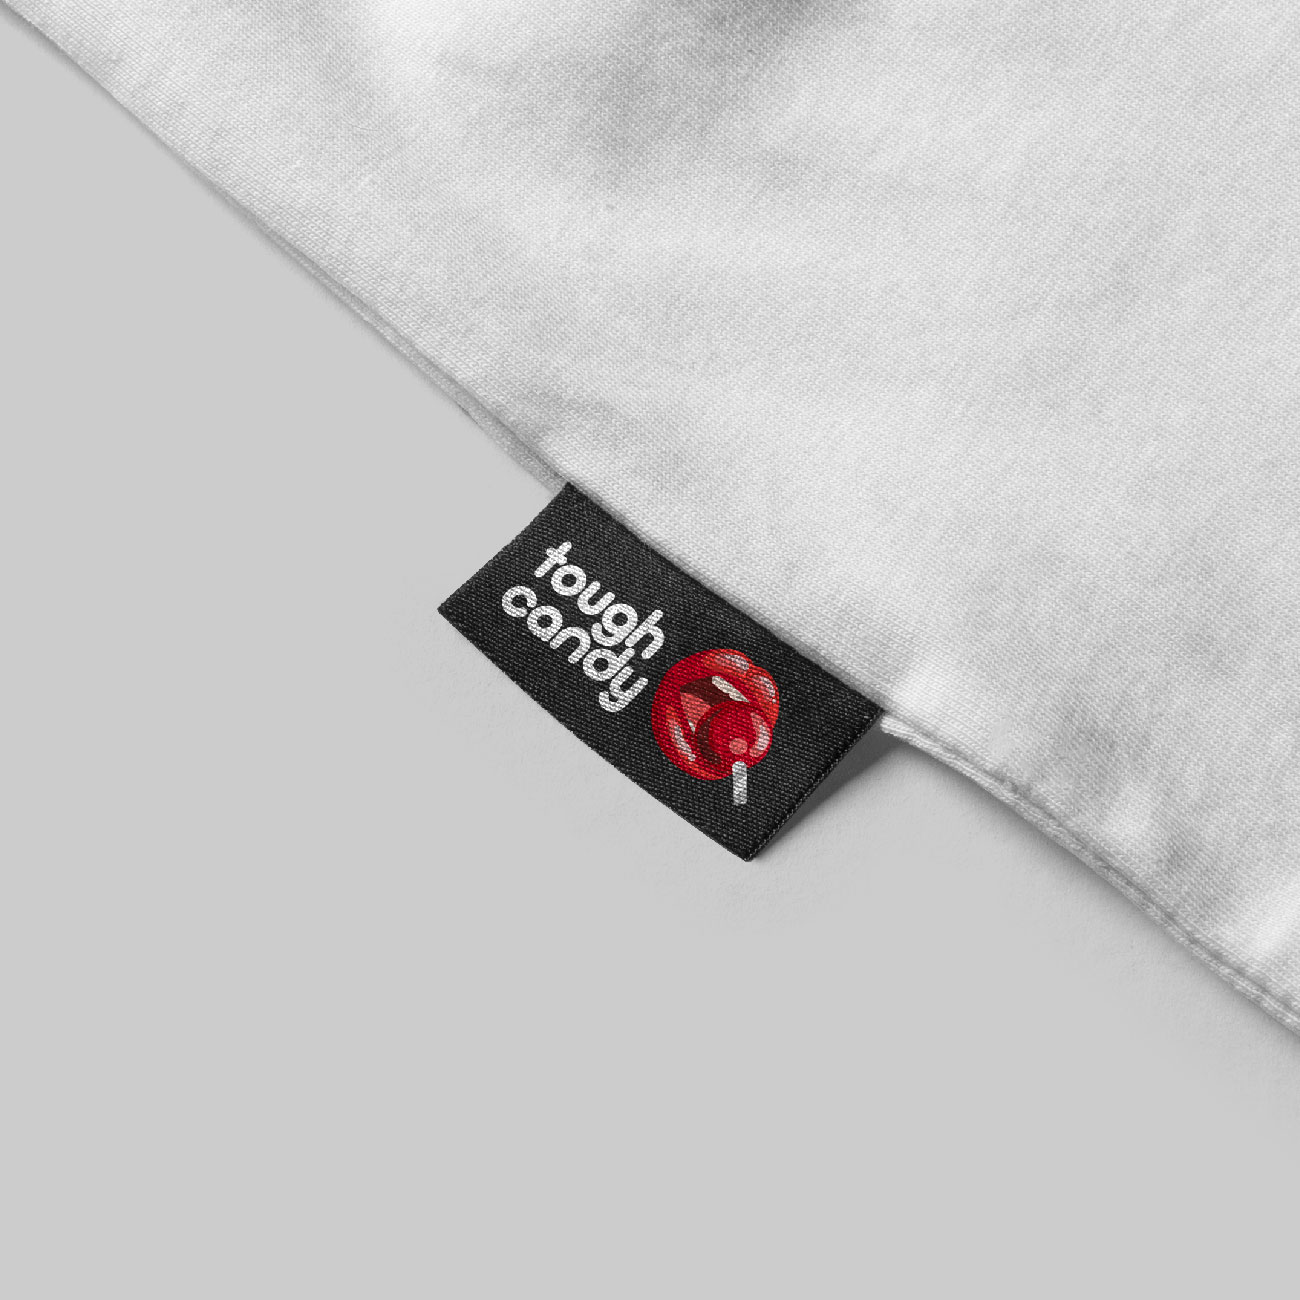 tough candy general condition studio design graphic branding logo visual identity website design berlin paris newyork london madrid